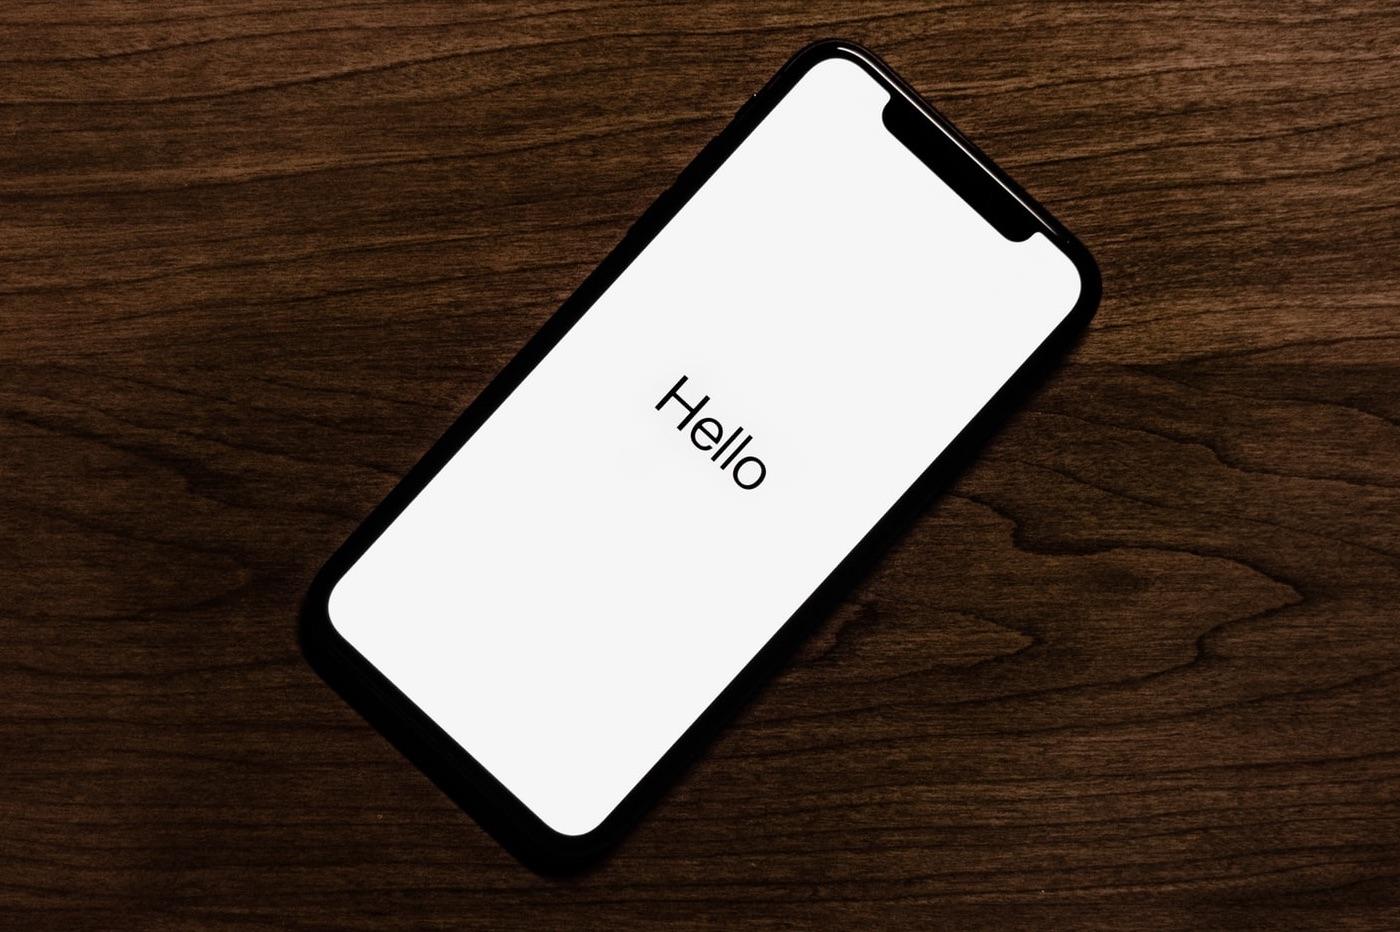 iPhone Face ID démarrage